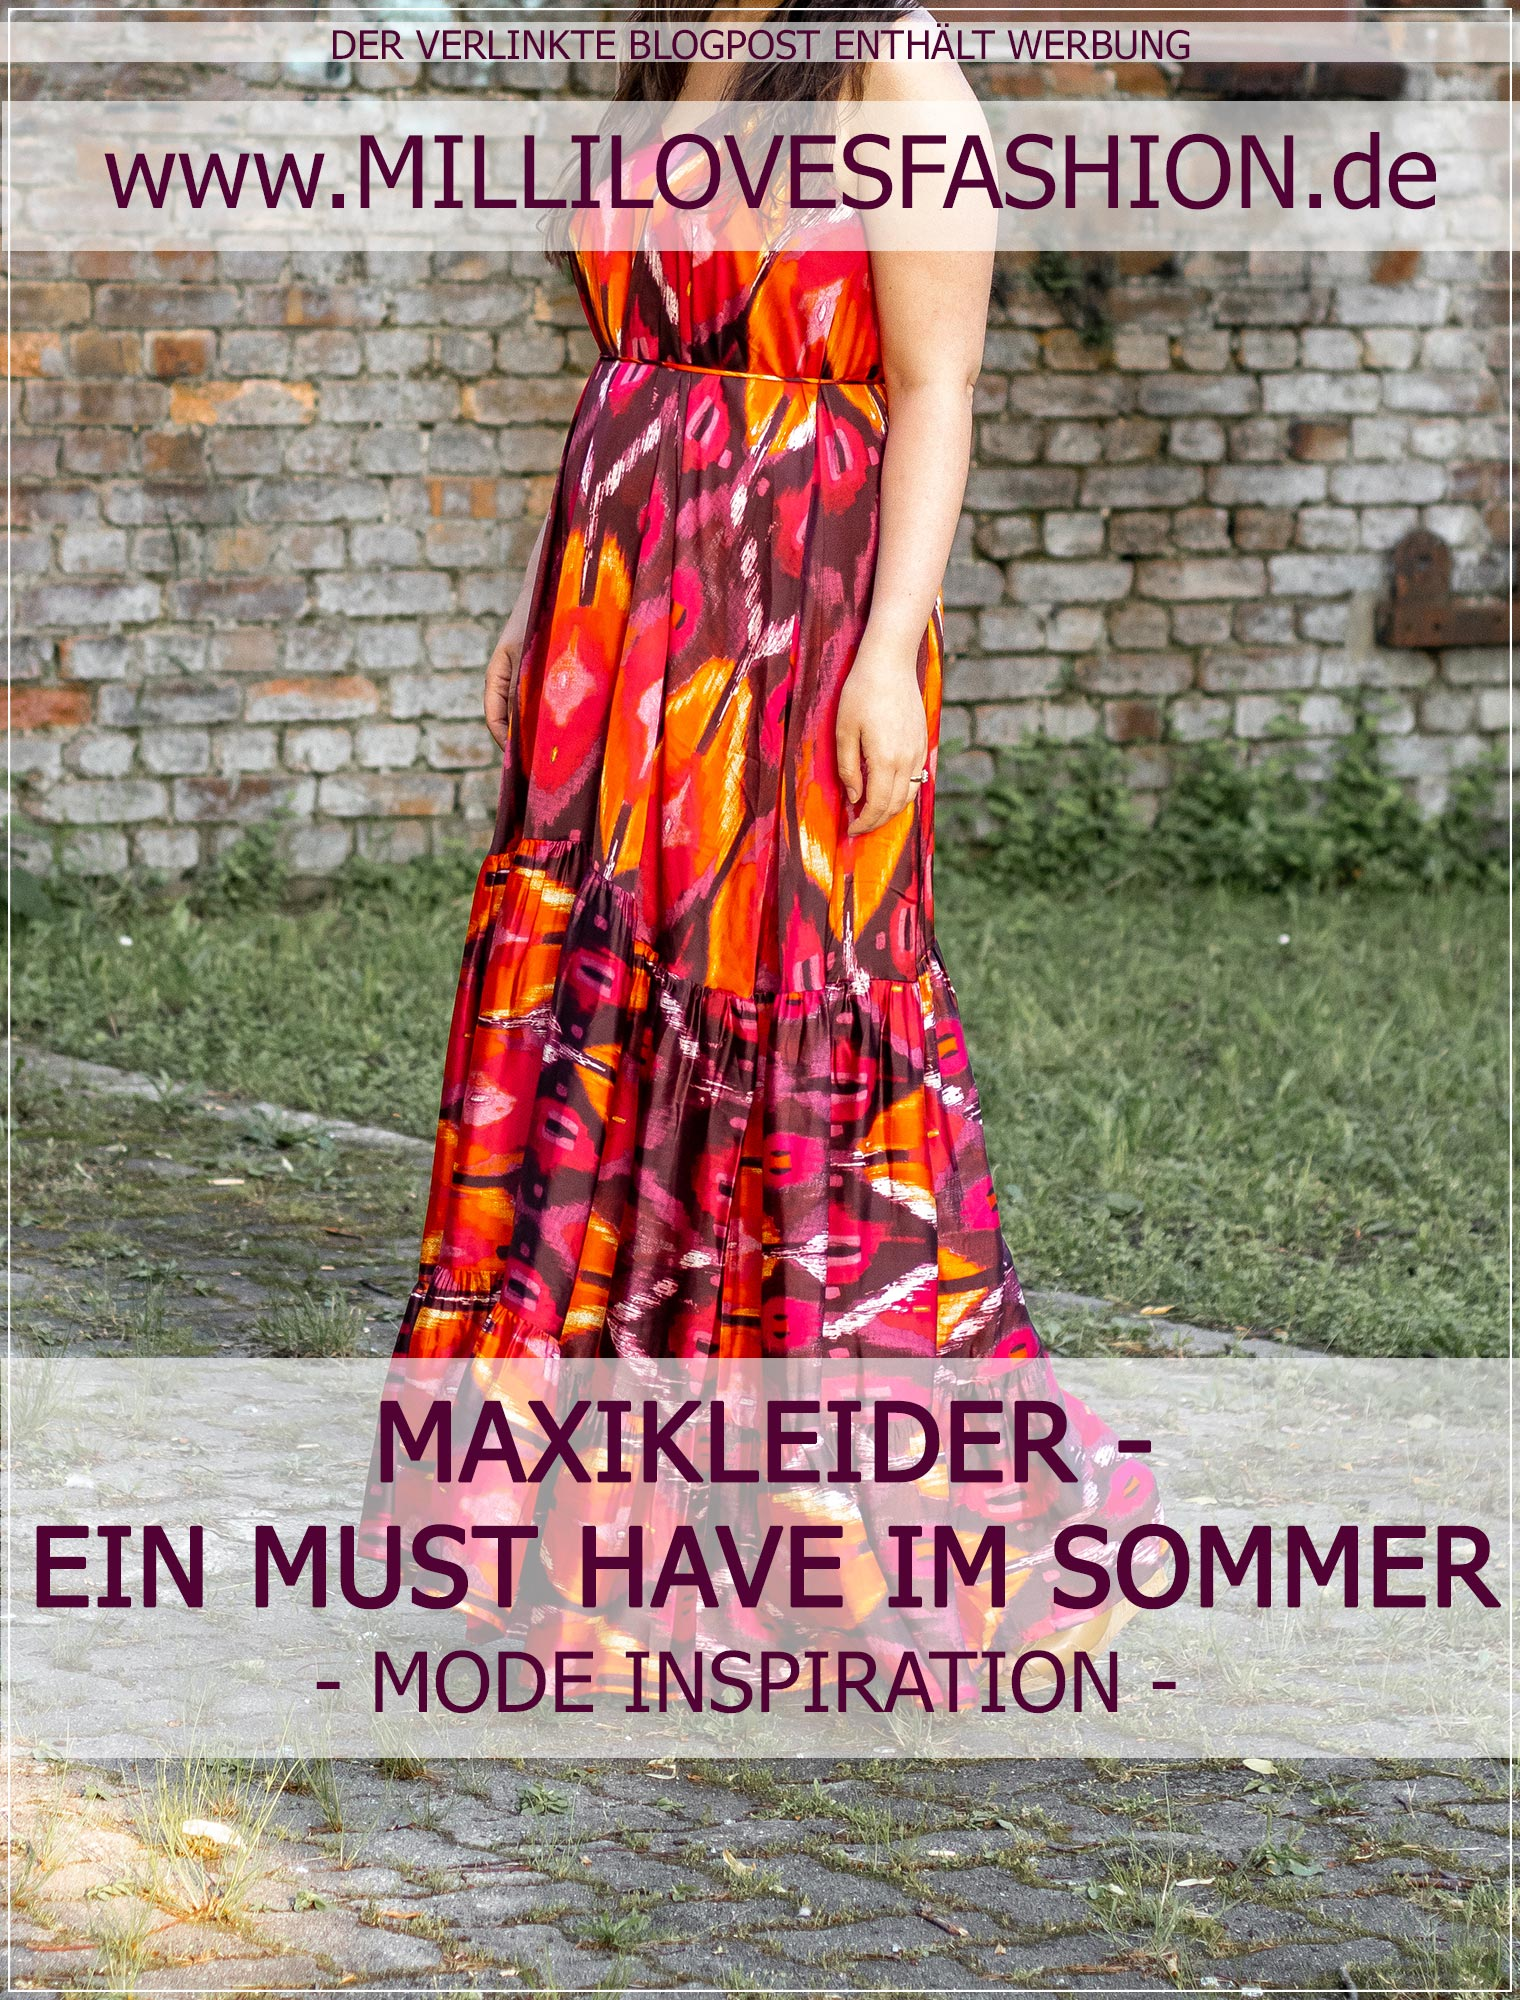 Buntes Maxikleid als Must Have im Sommer